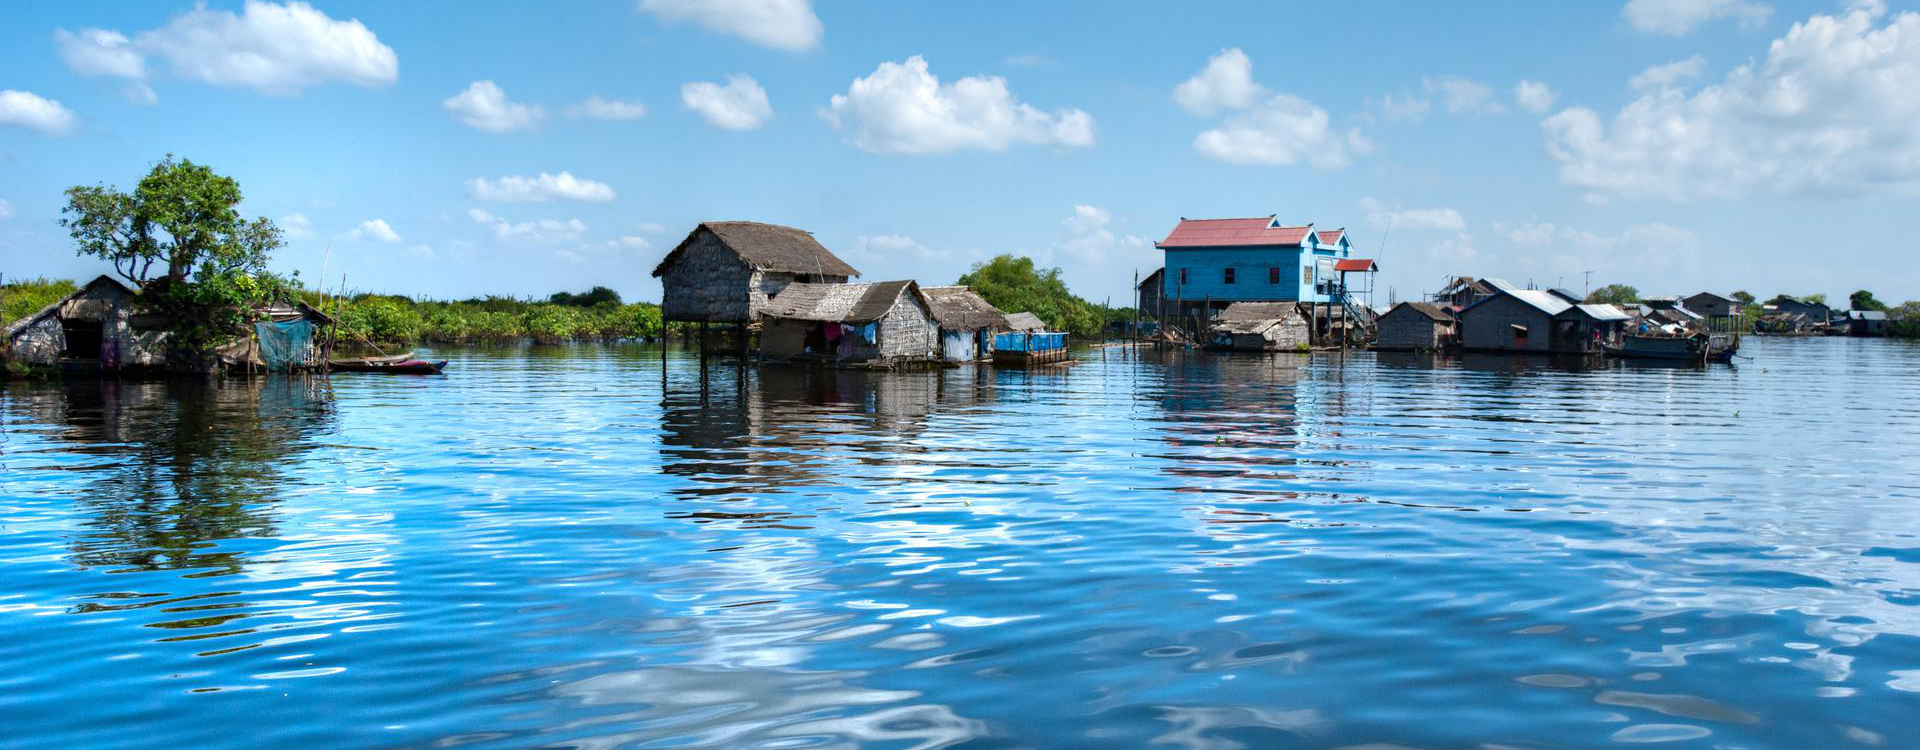 cambodge-azurexpat